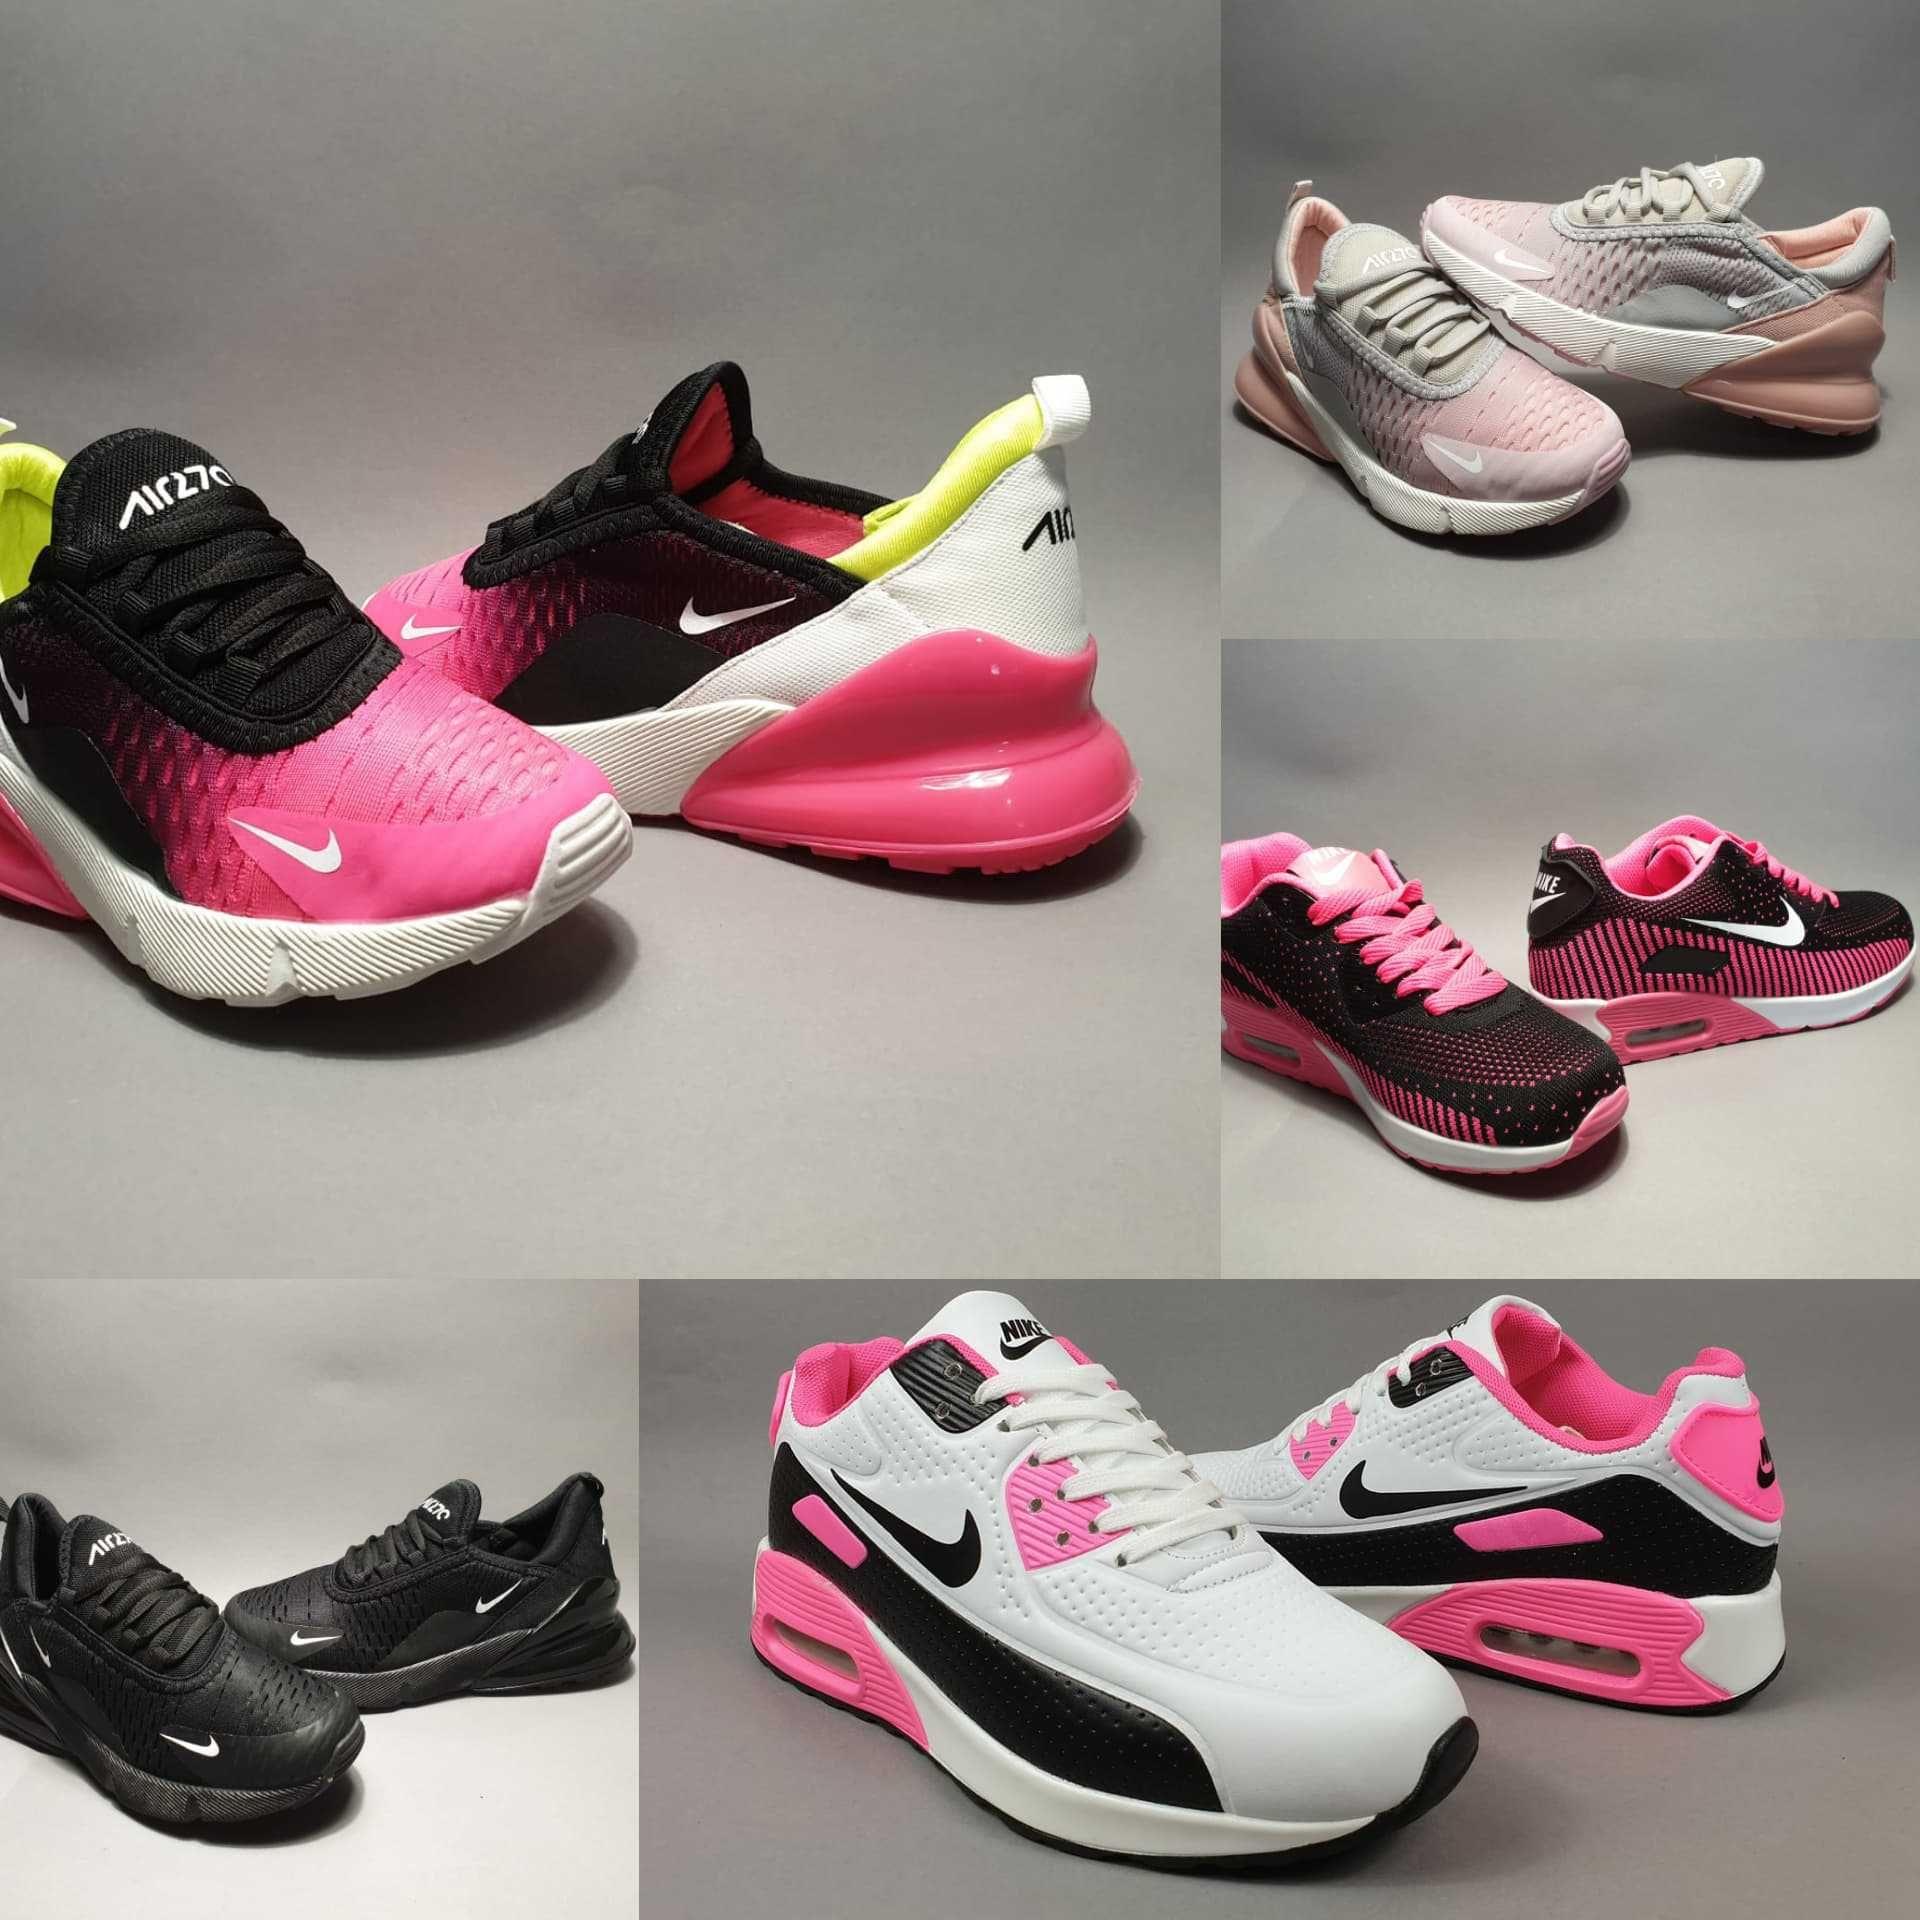 Damskie buty adidasy nike logo adidas maxy air max 36-41 air 270